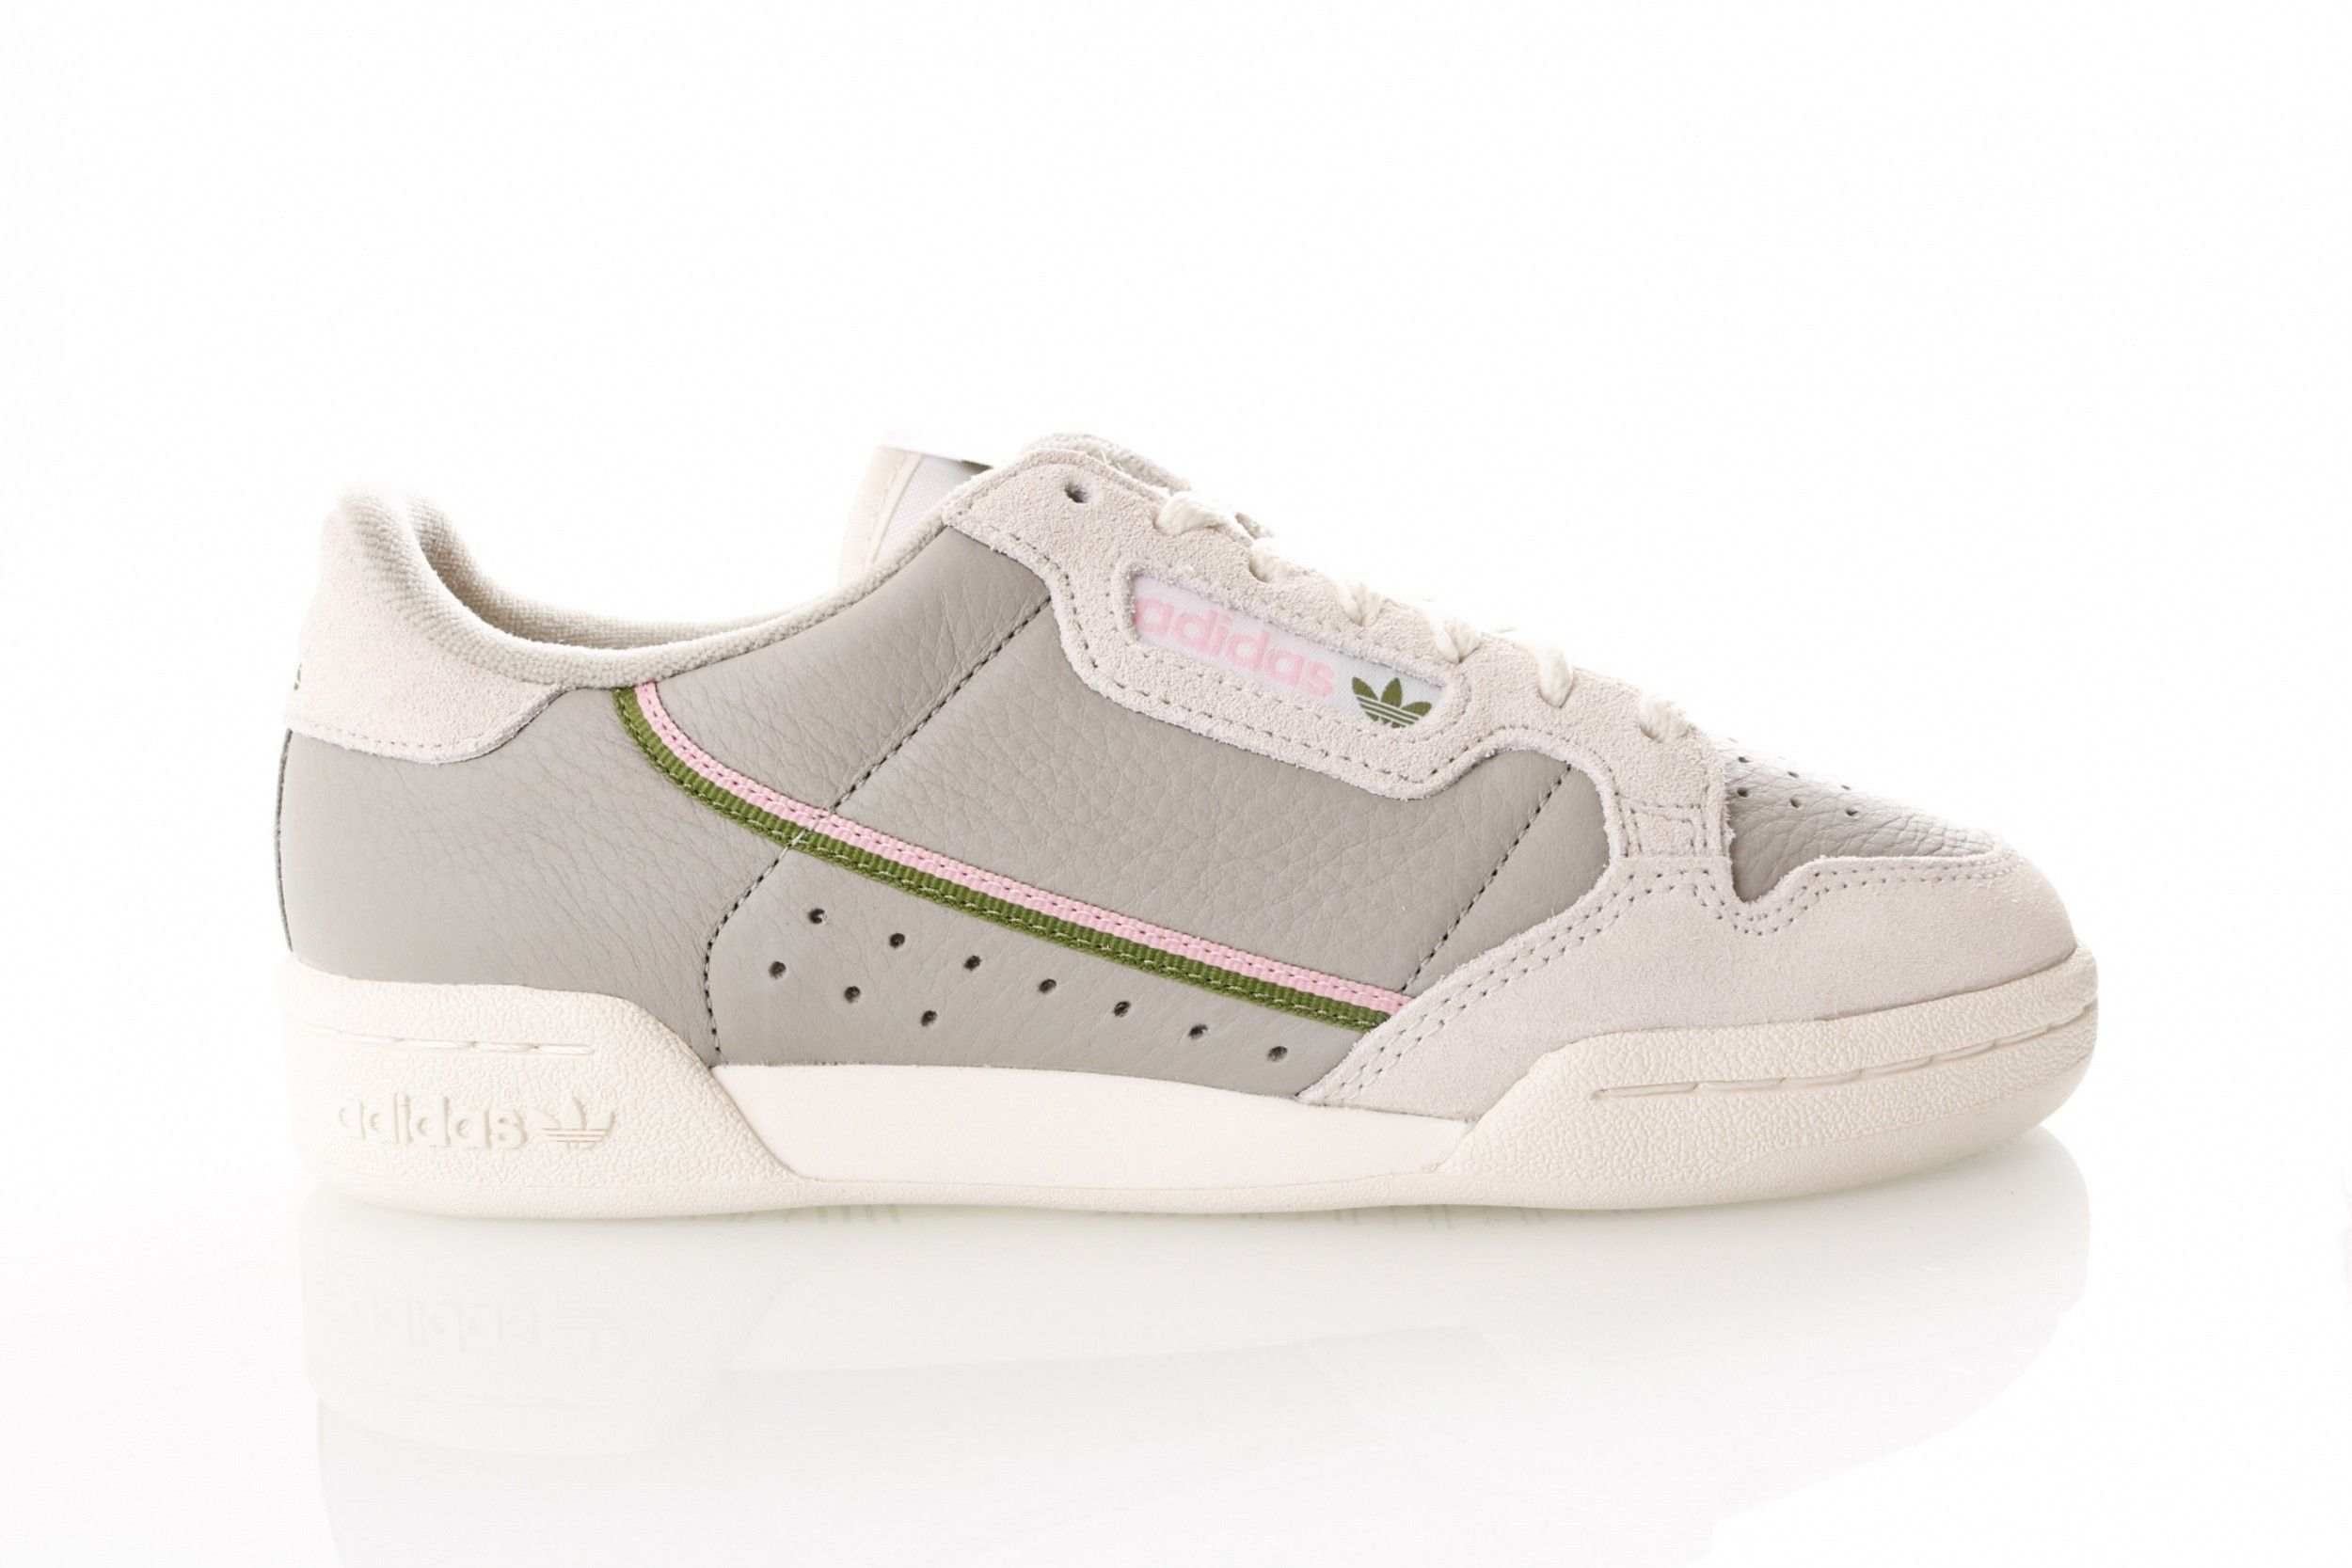 Afbeelding van Adidas Continental 80 W Ee5558 Sneakers Sesame/Raw White/Off White